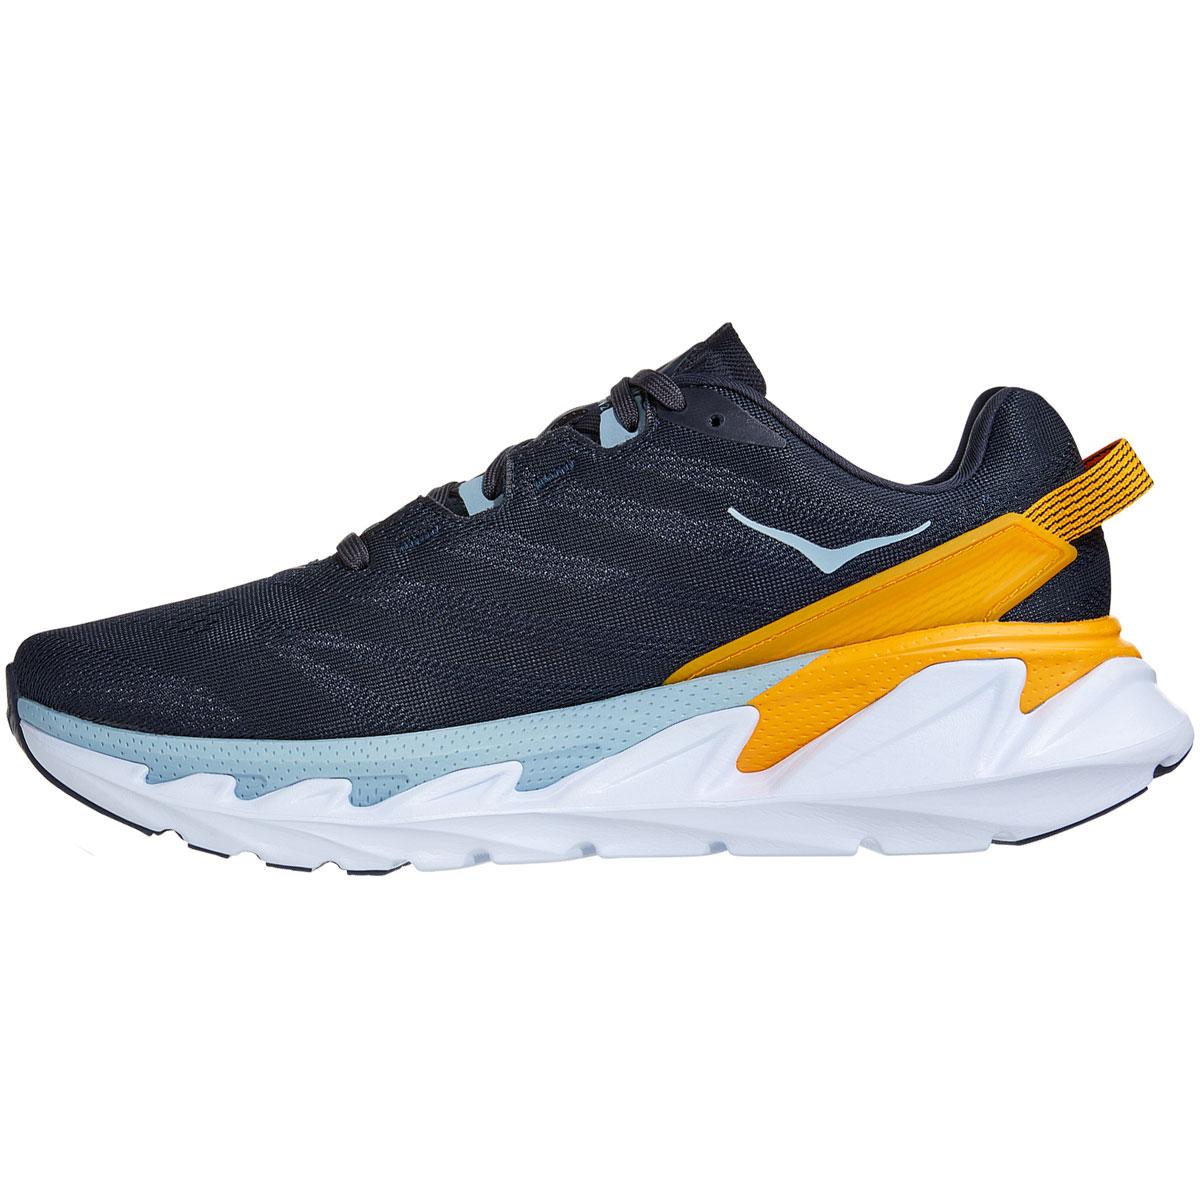 Men's Hoka One One Elevon 2 Running Shoe - Color: Ombre Blue - Size: 7 - Width: Regular, Ombre Blue, large, image 2